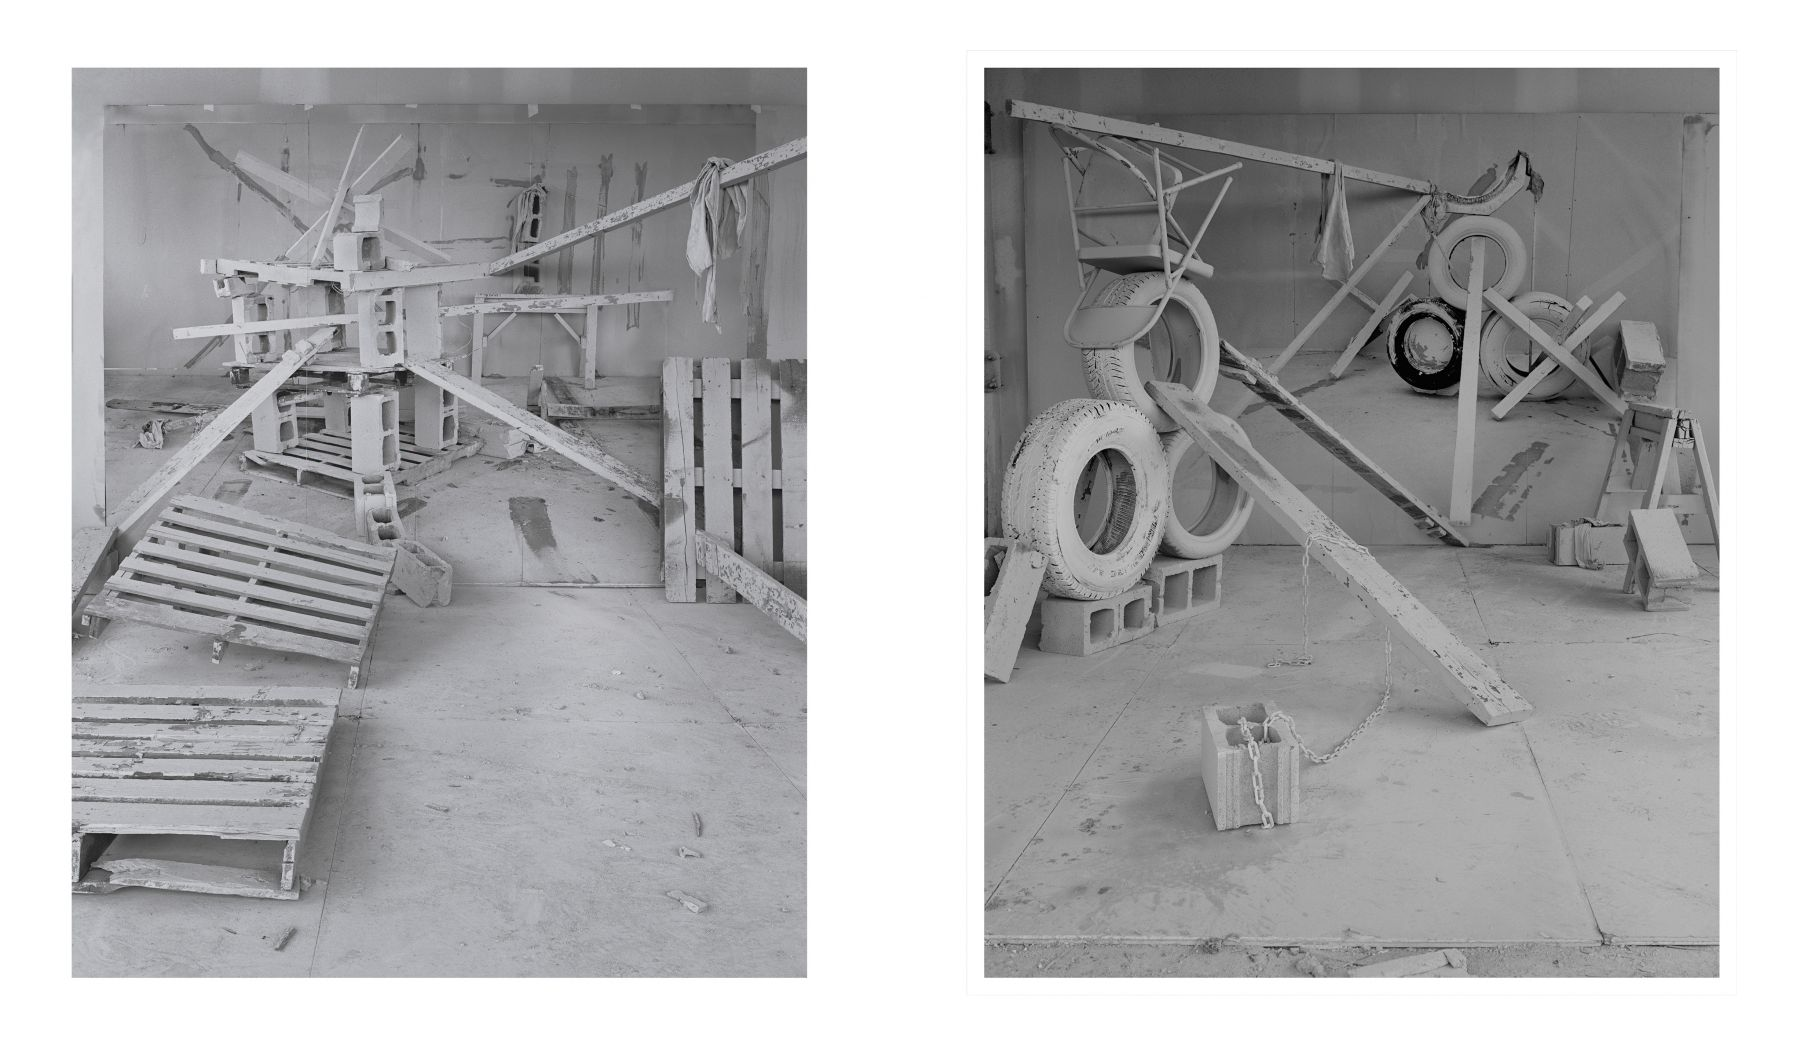 Two Barricade photographs by Rodrigo Valenzuela